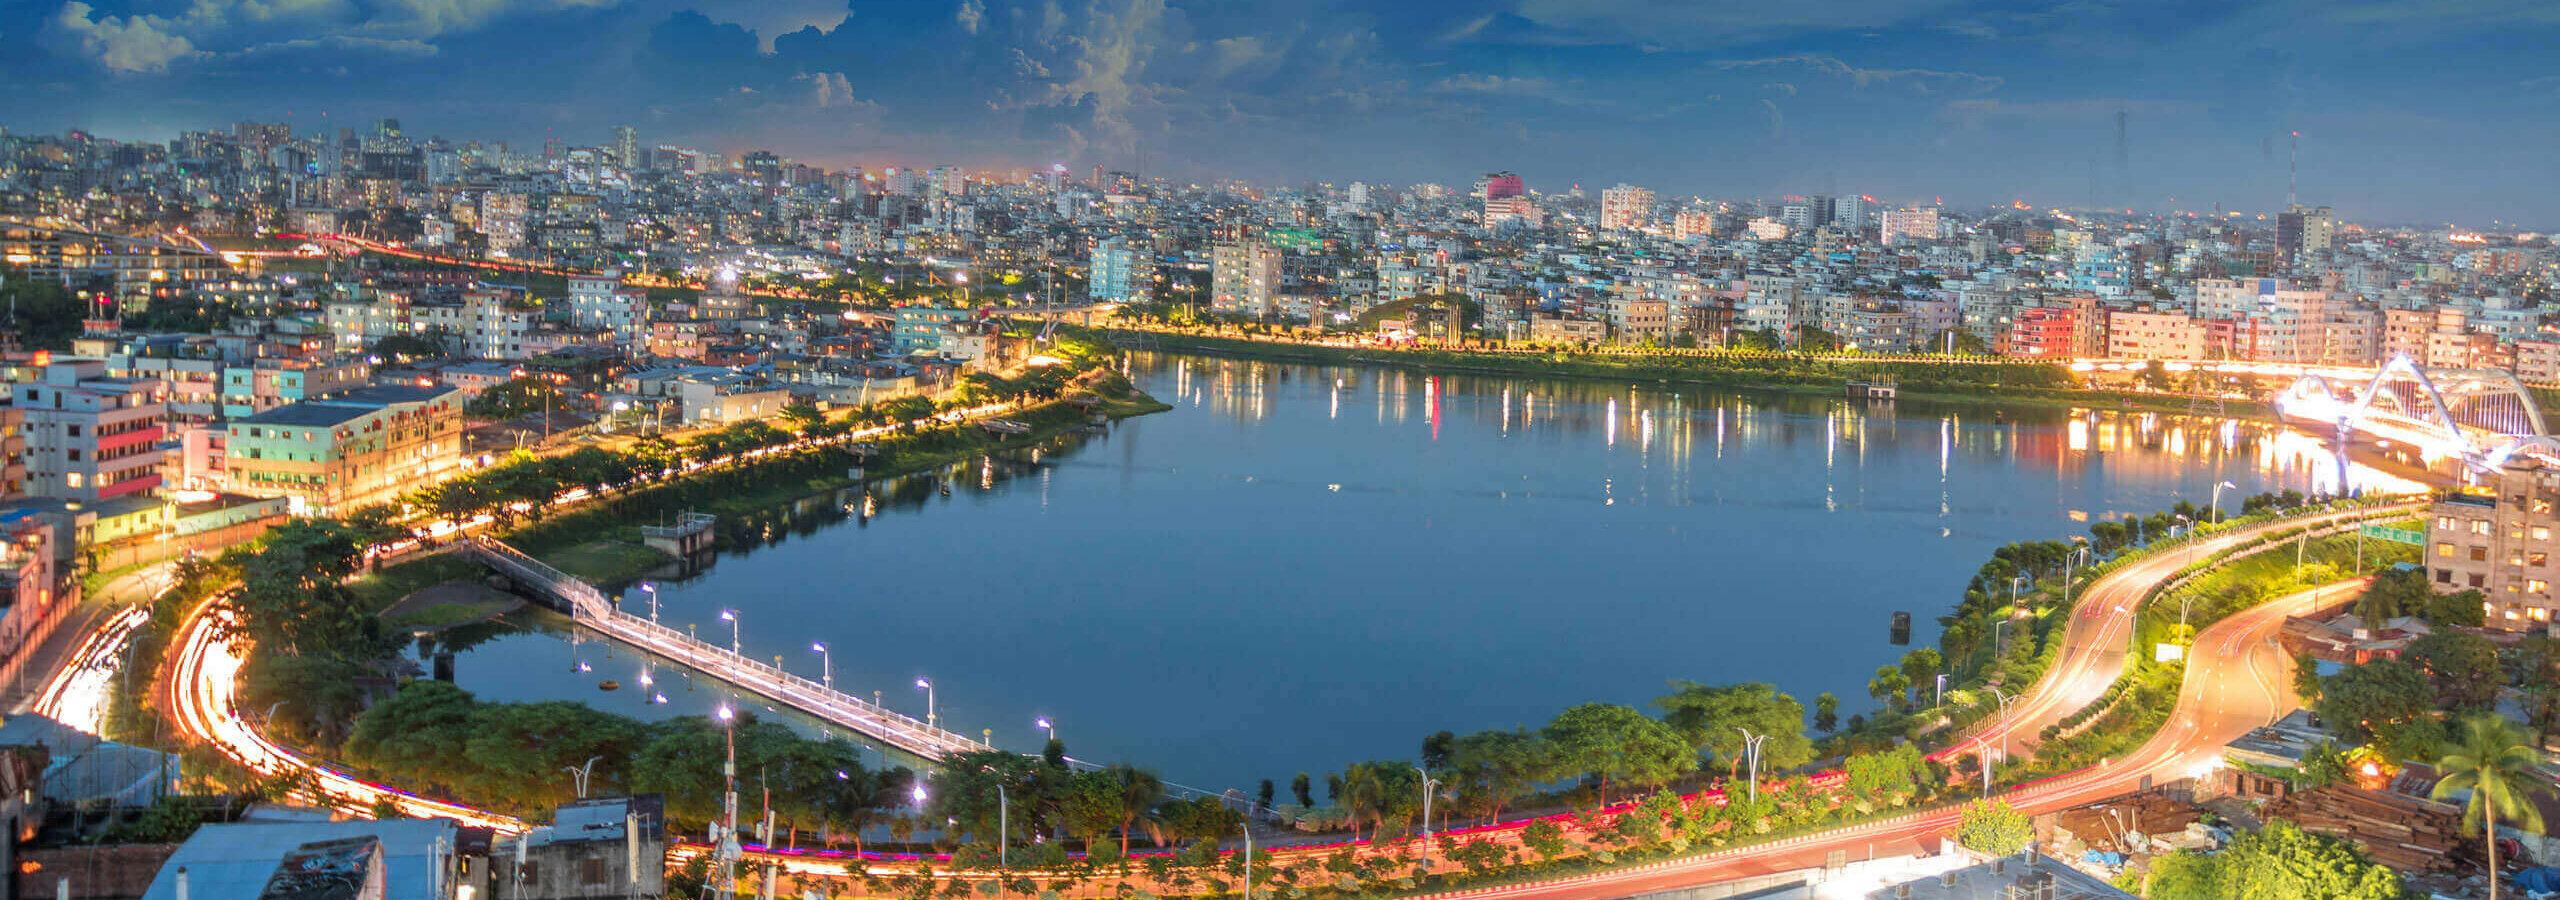 Tysers Insurance Brokers | Tyser Risk Management (Bangladesh)